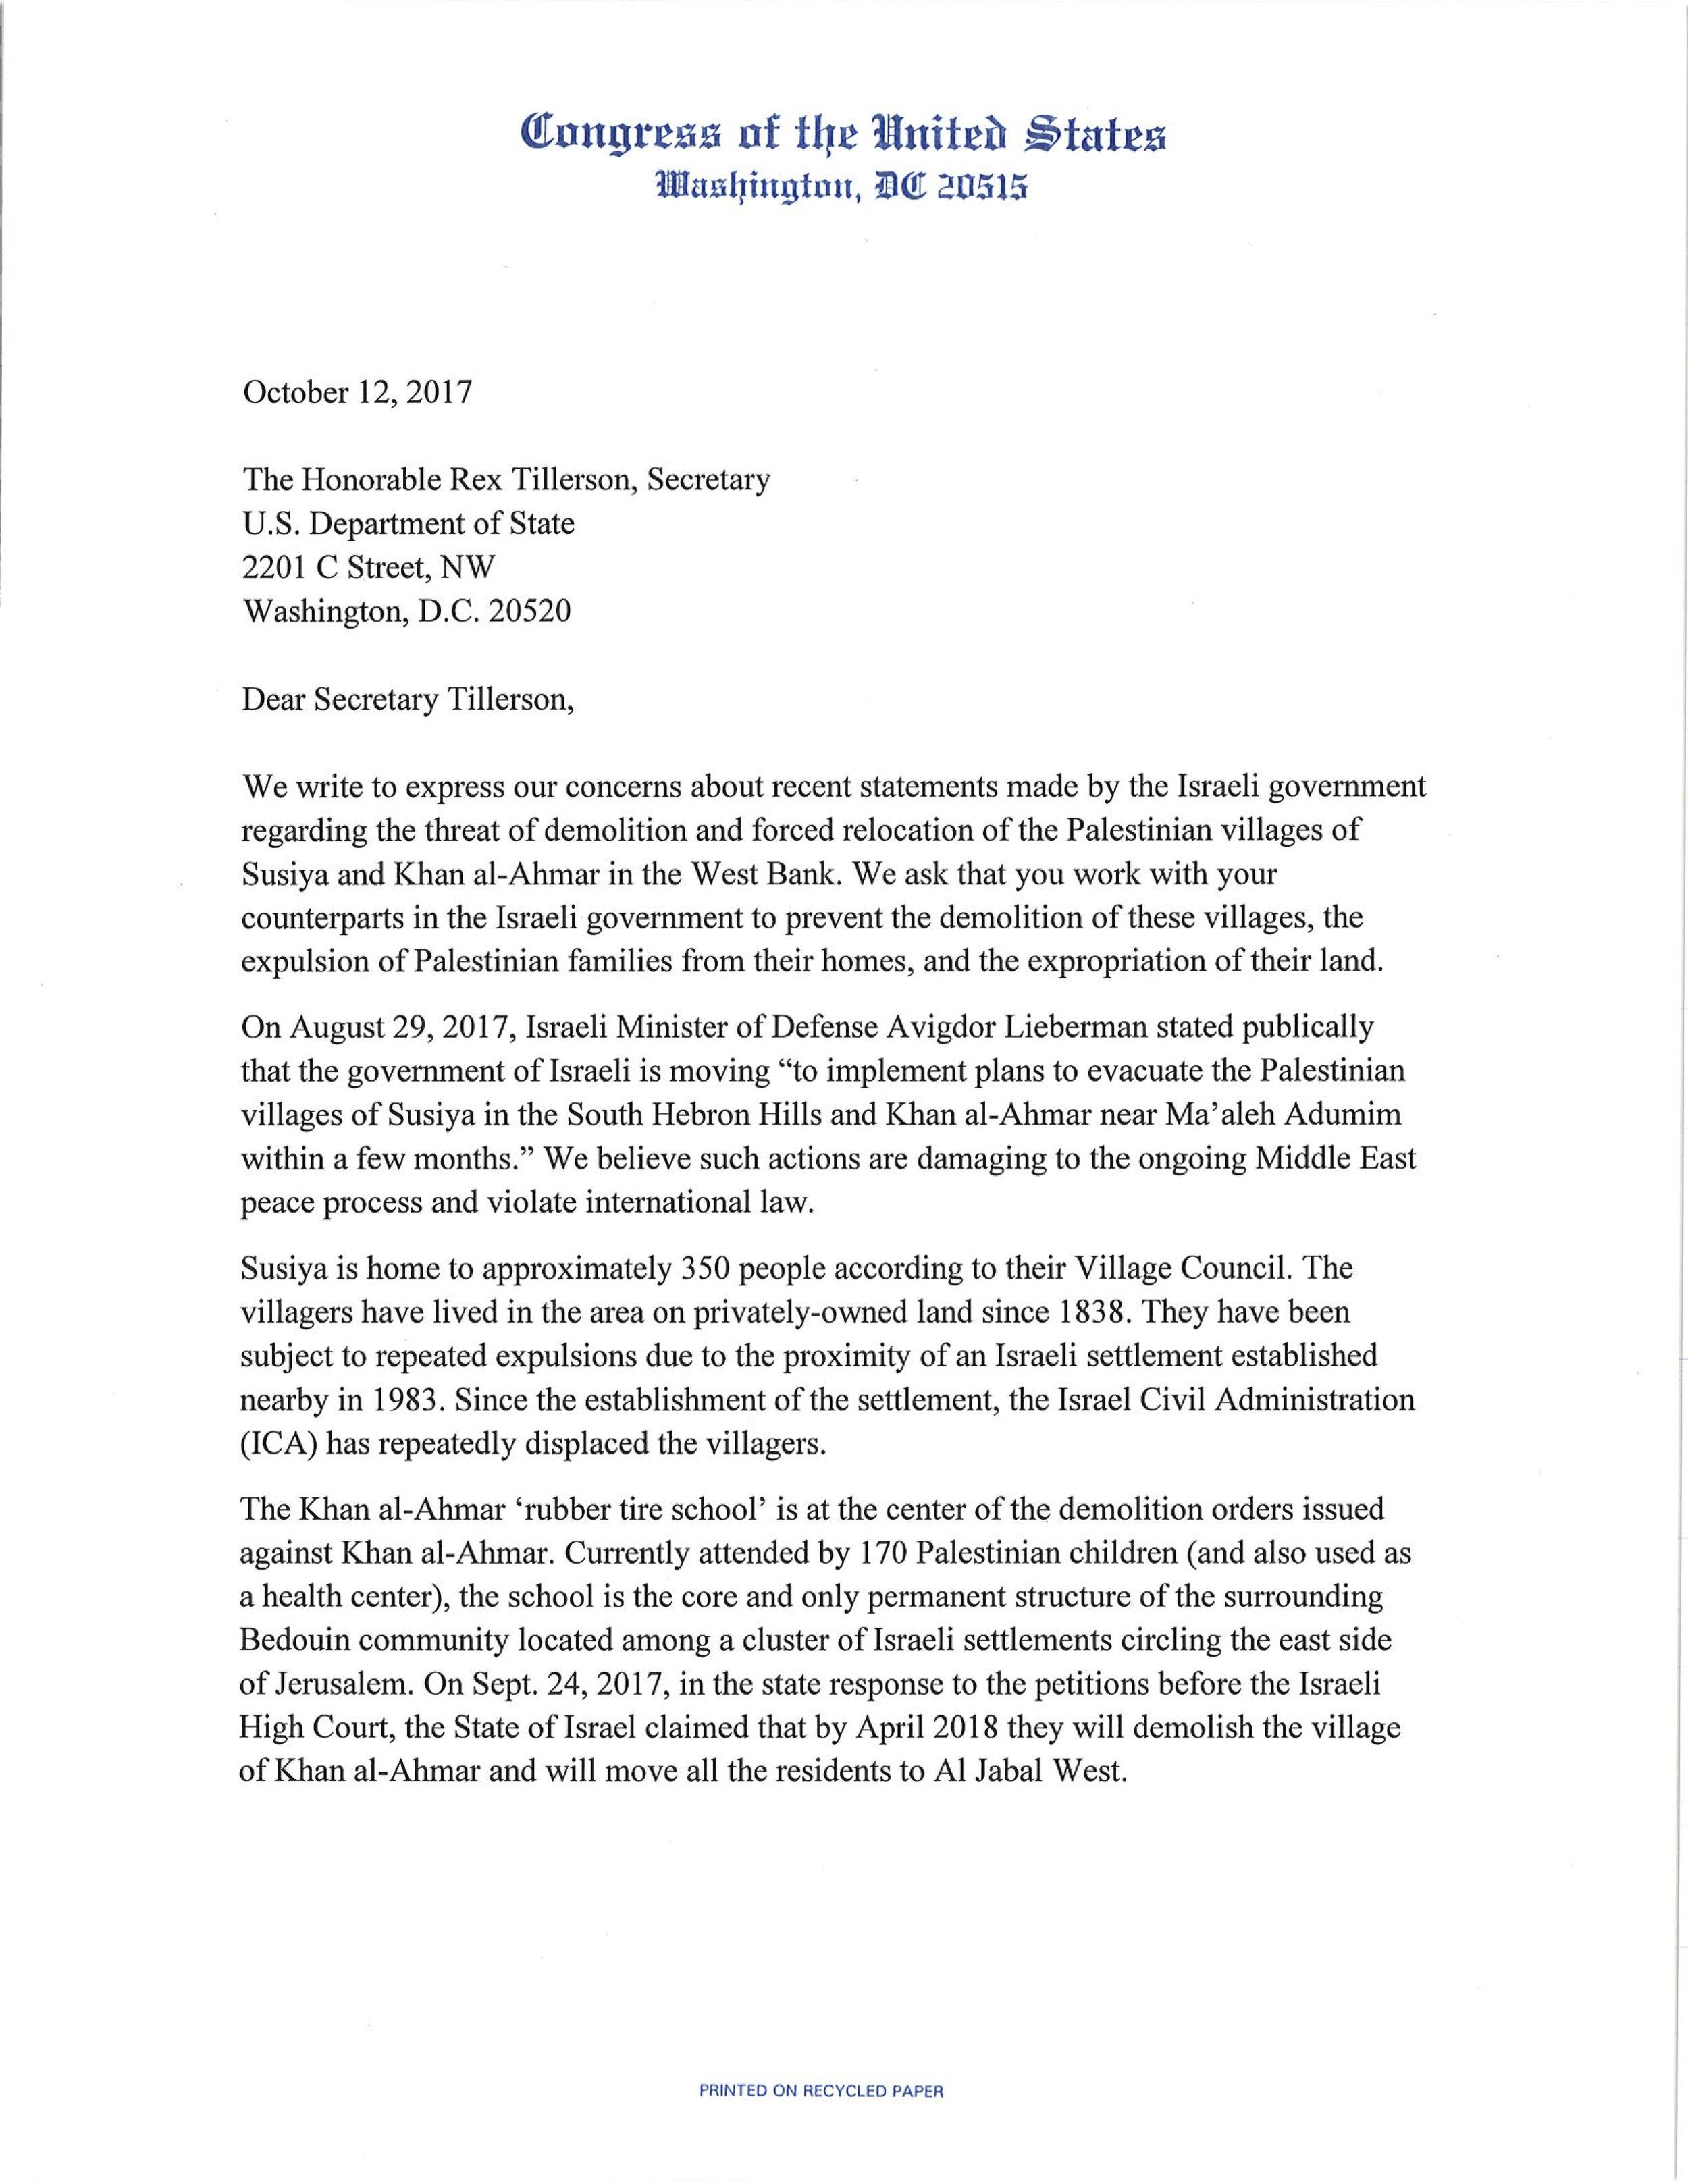 Letter to Secretary Tillerson on Susiya and Khan al Ahmar 10.12.17.jpg